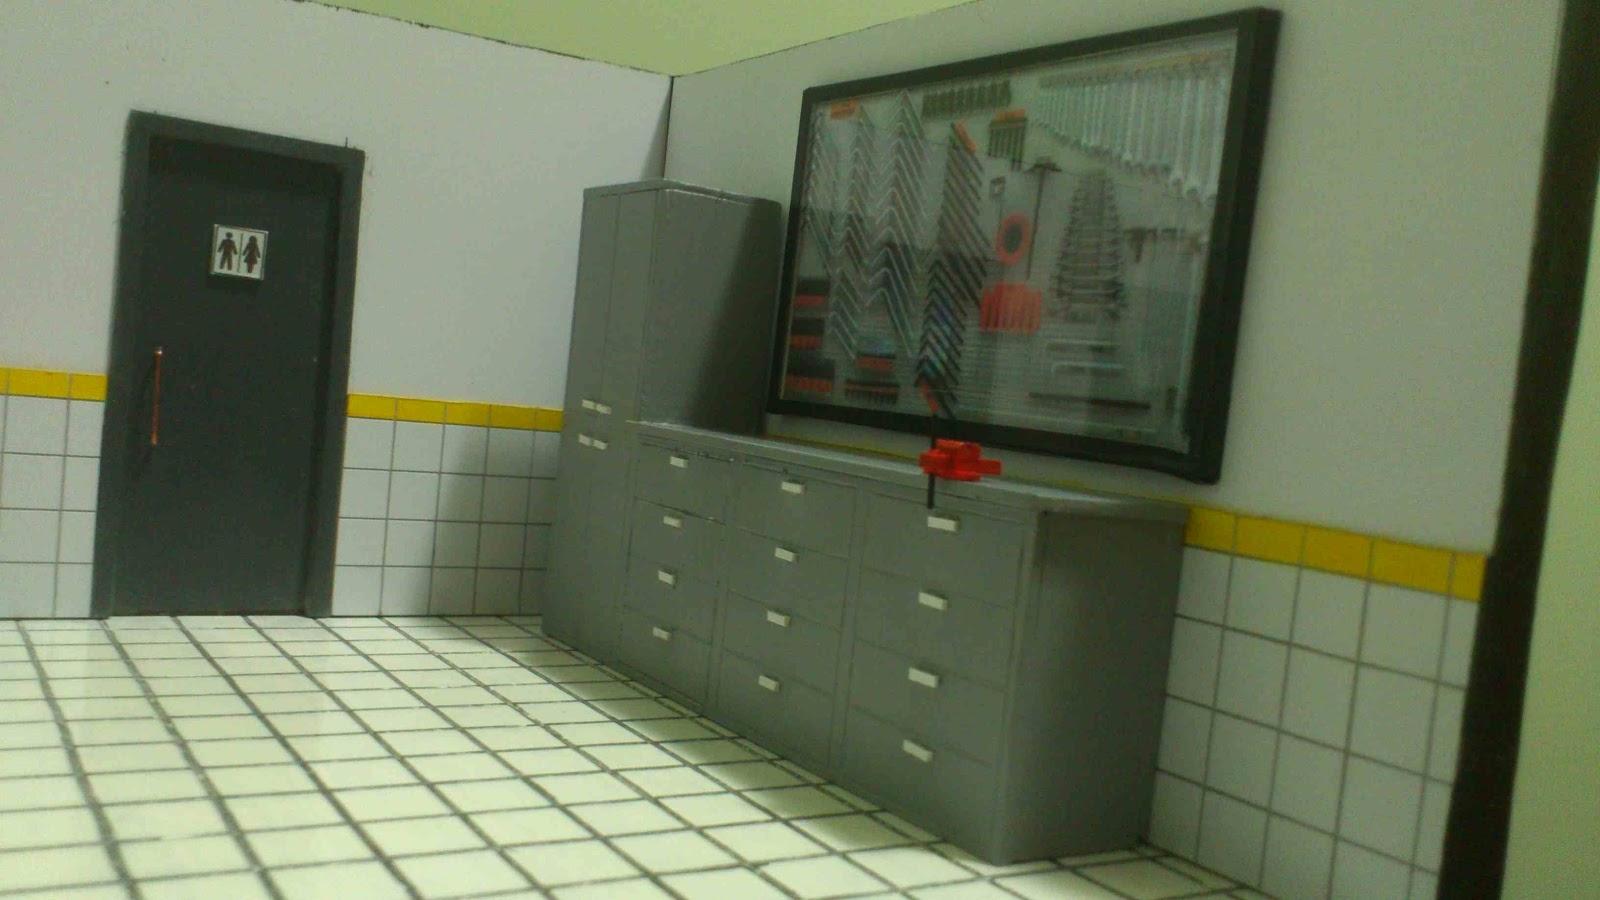 POLO MINIATURAS: Diorama Oficina Mecânica #AD9601 1600x900